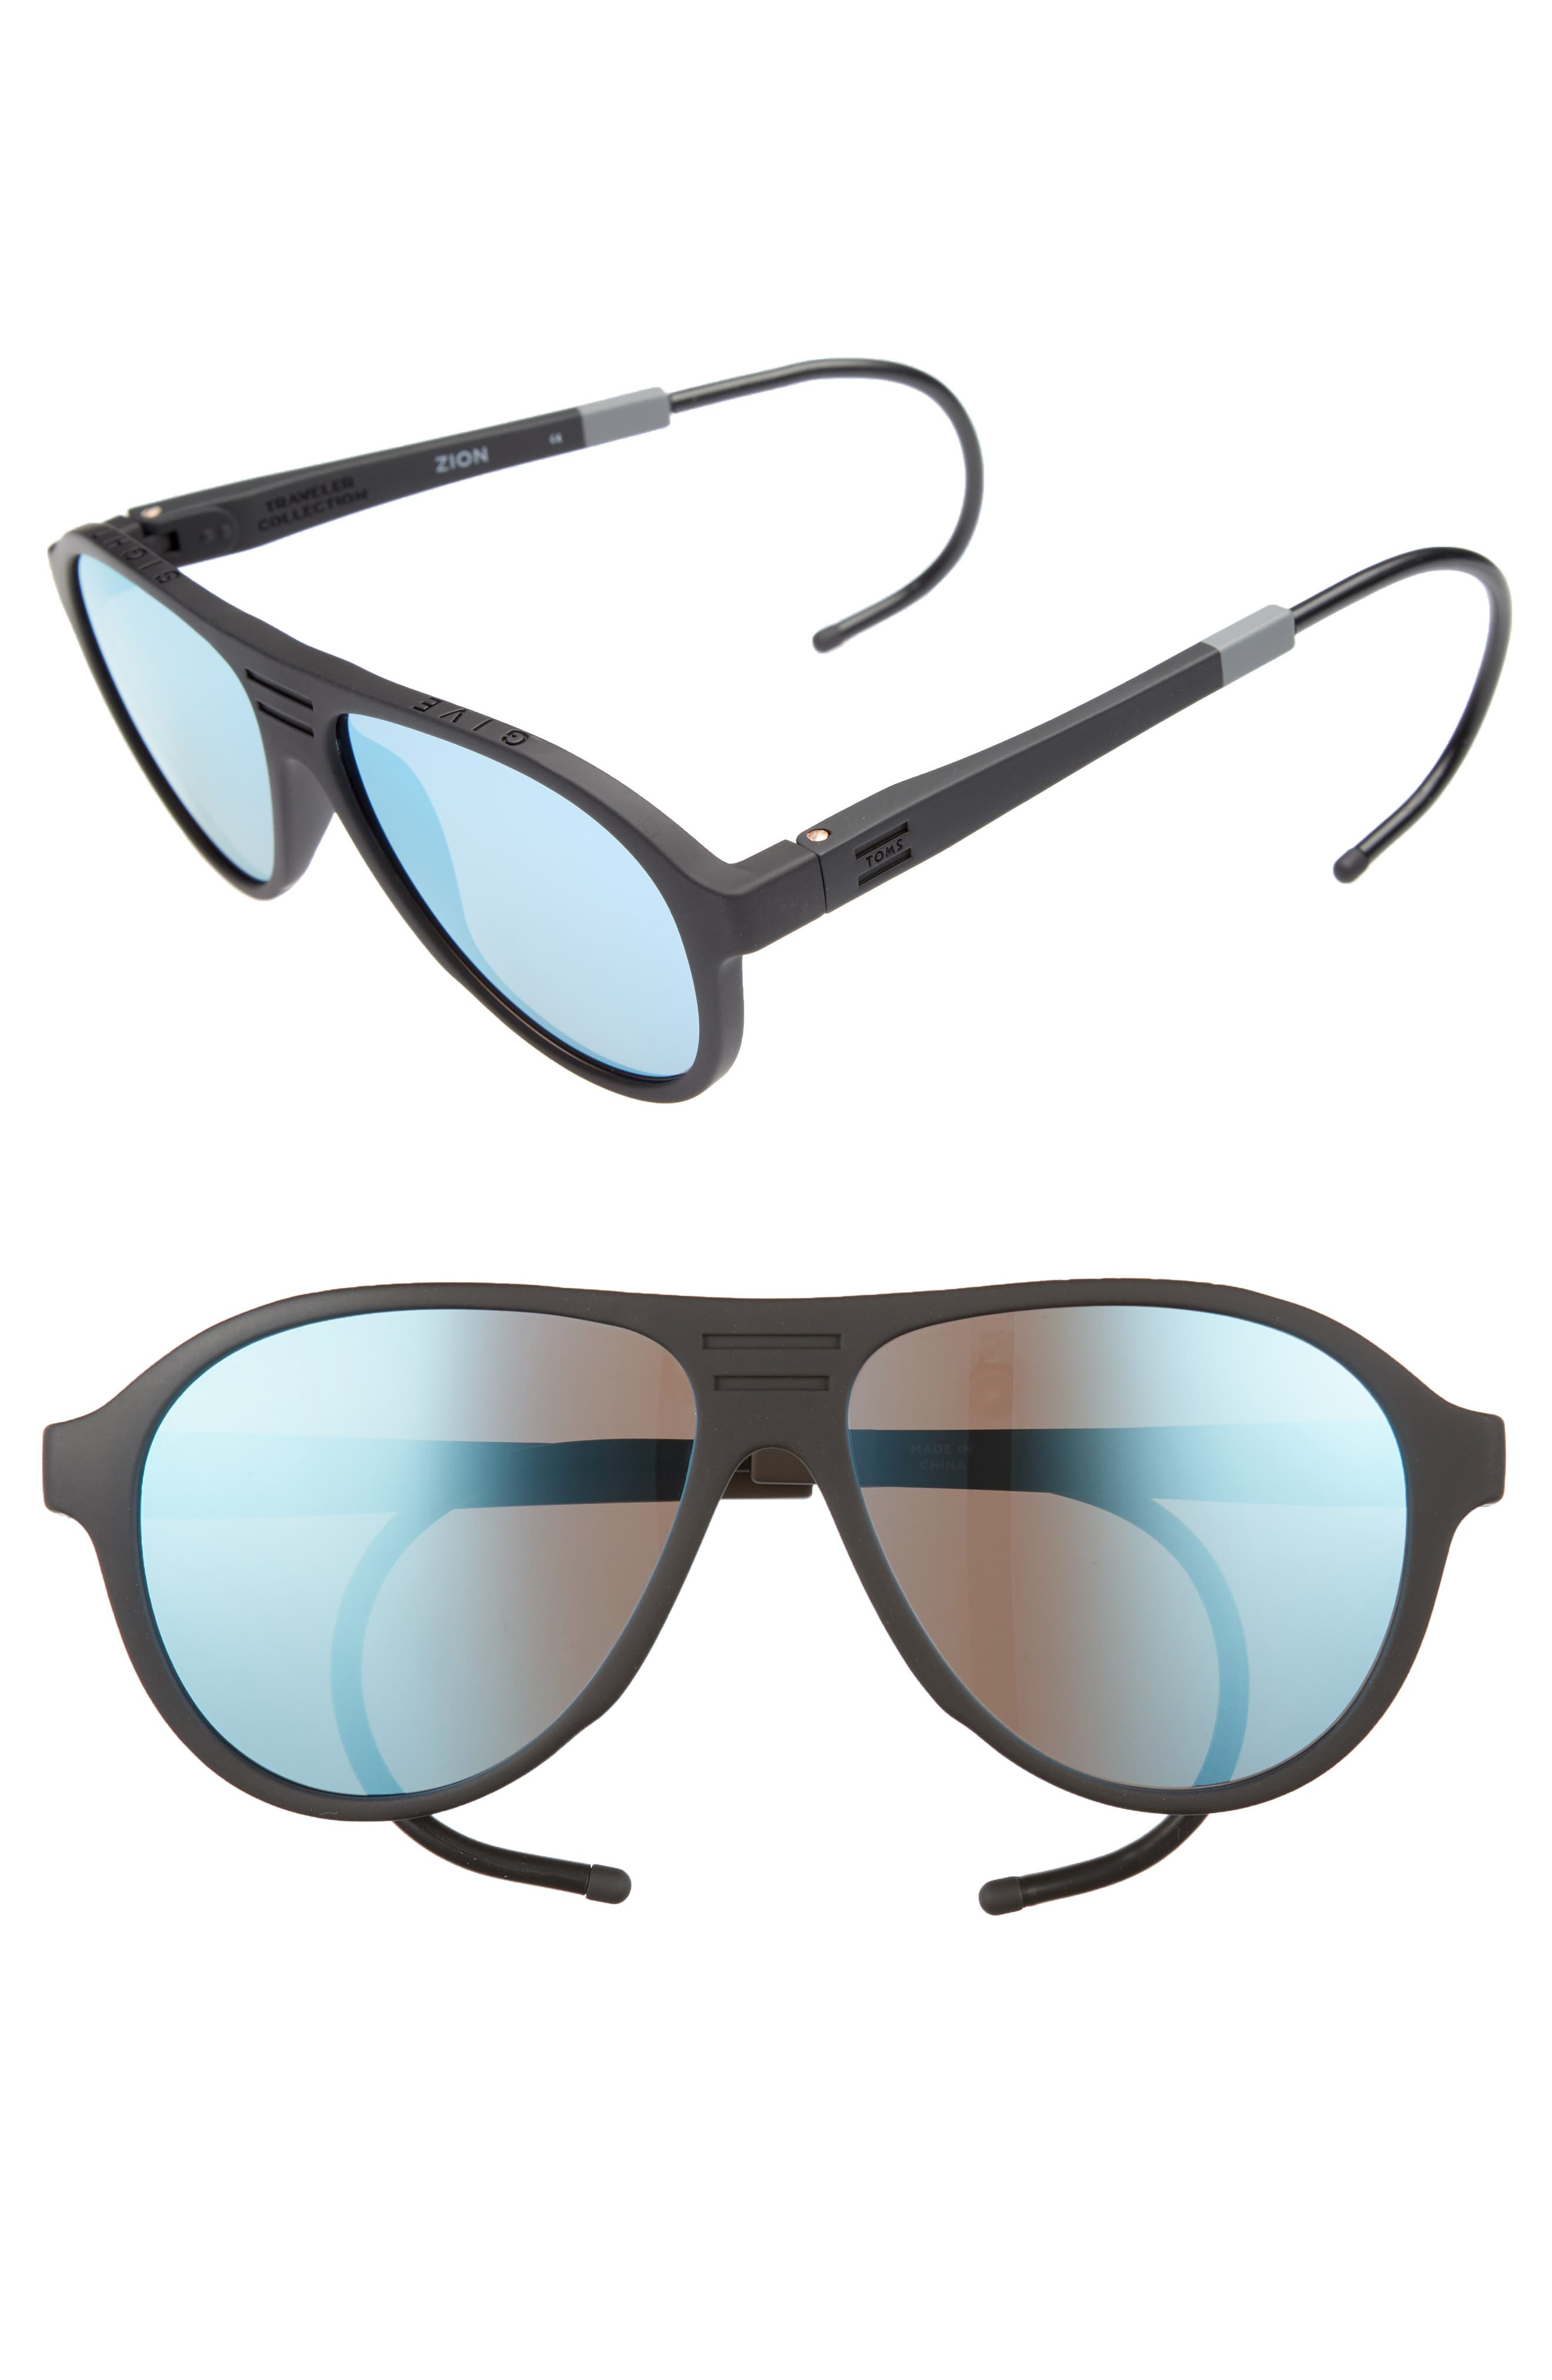 Traveler Zion 58mm Polarized Aviator Sunglasses,                             Main thumbnail 1, color,                             Matte Black/ Blue Mirror